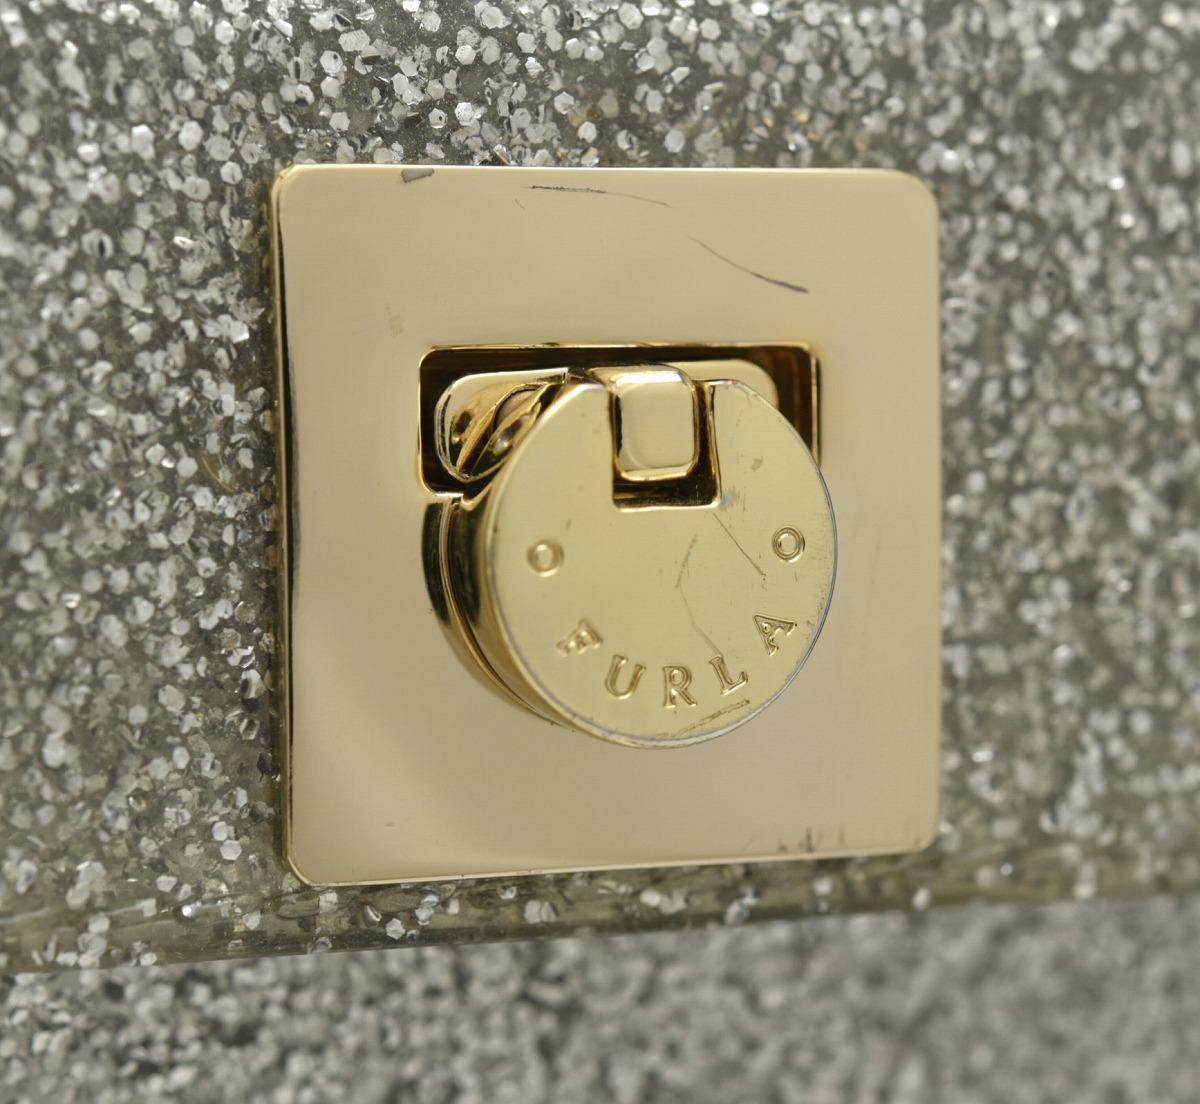 38ed02c8a751 【バッグ】FURLAフルラグリッターキャンディハンドバッグショルダーバッグ2WAYPVCラメグレーシルバーゴールド金具